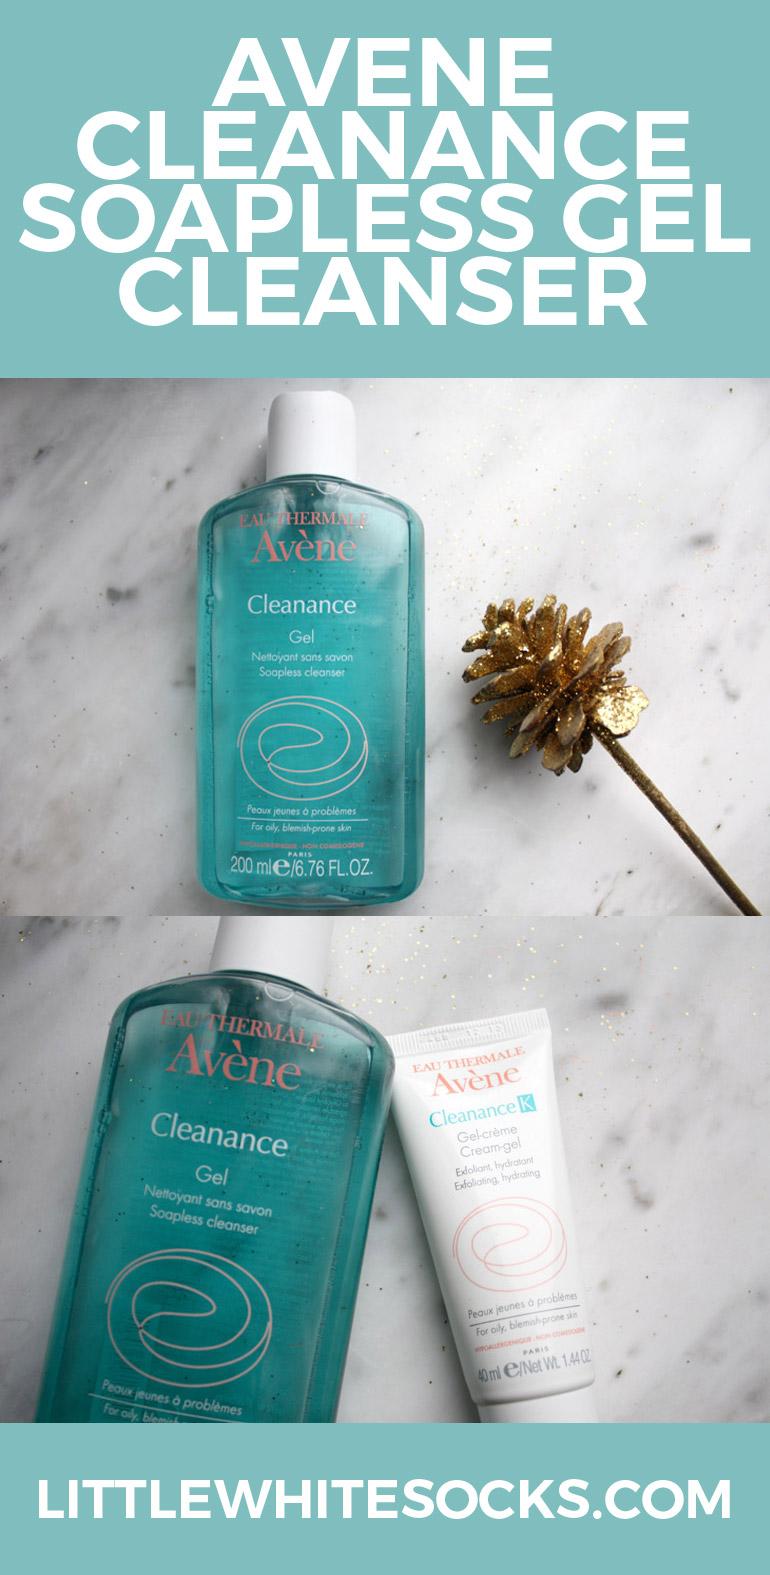 avene cleanance soapless gel cleanser and exfoliating hydrating cream-gel